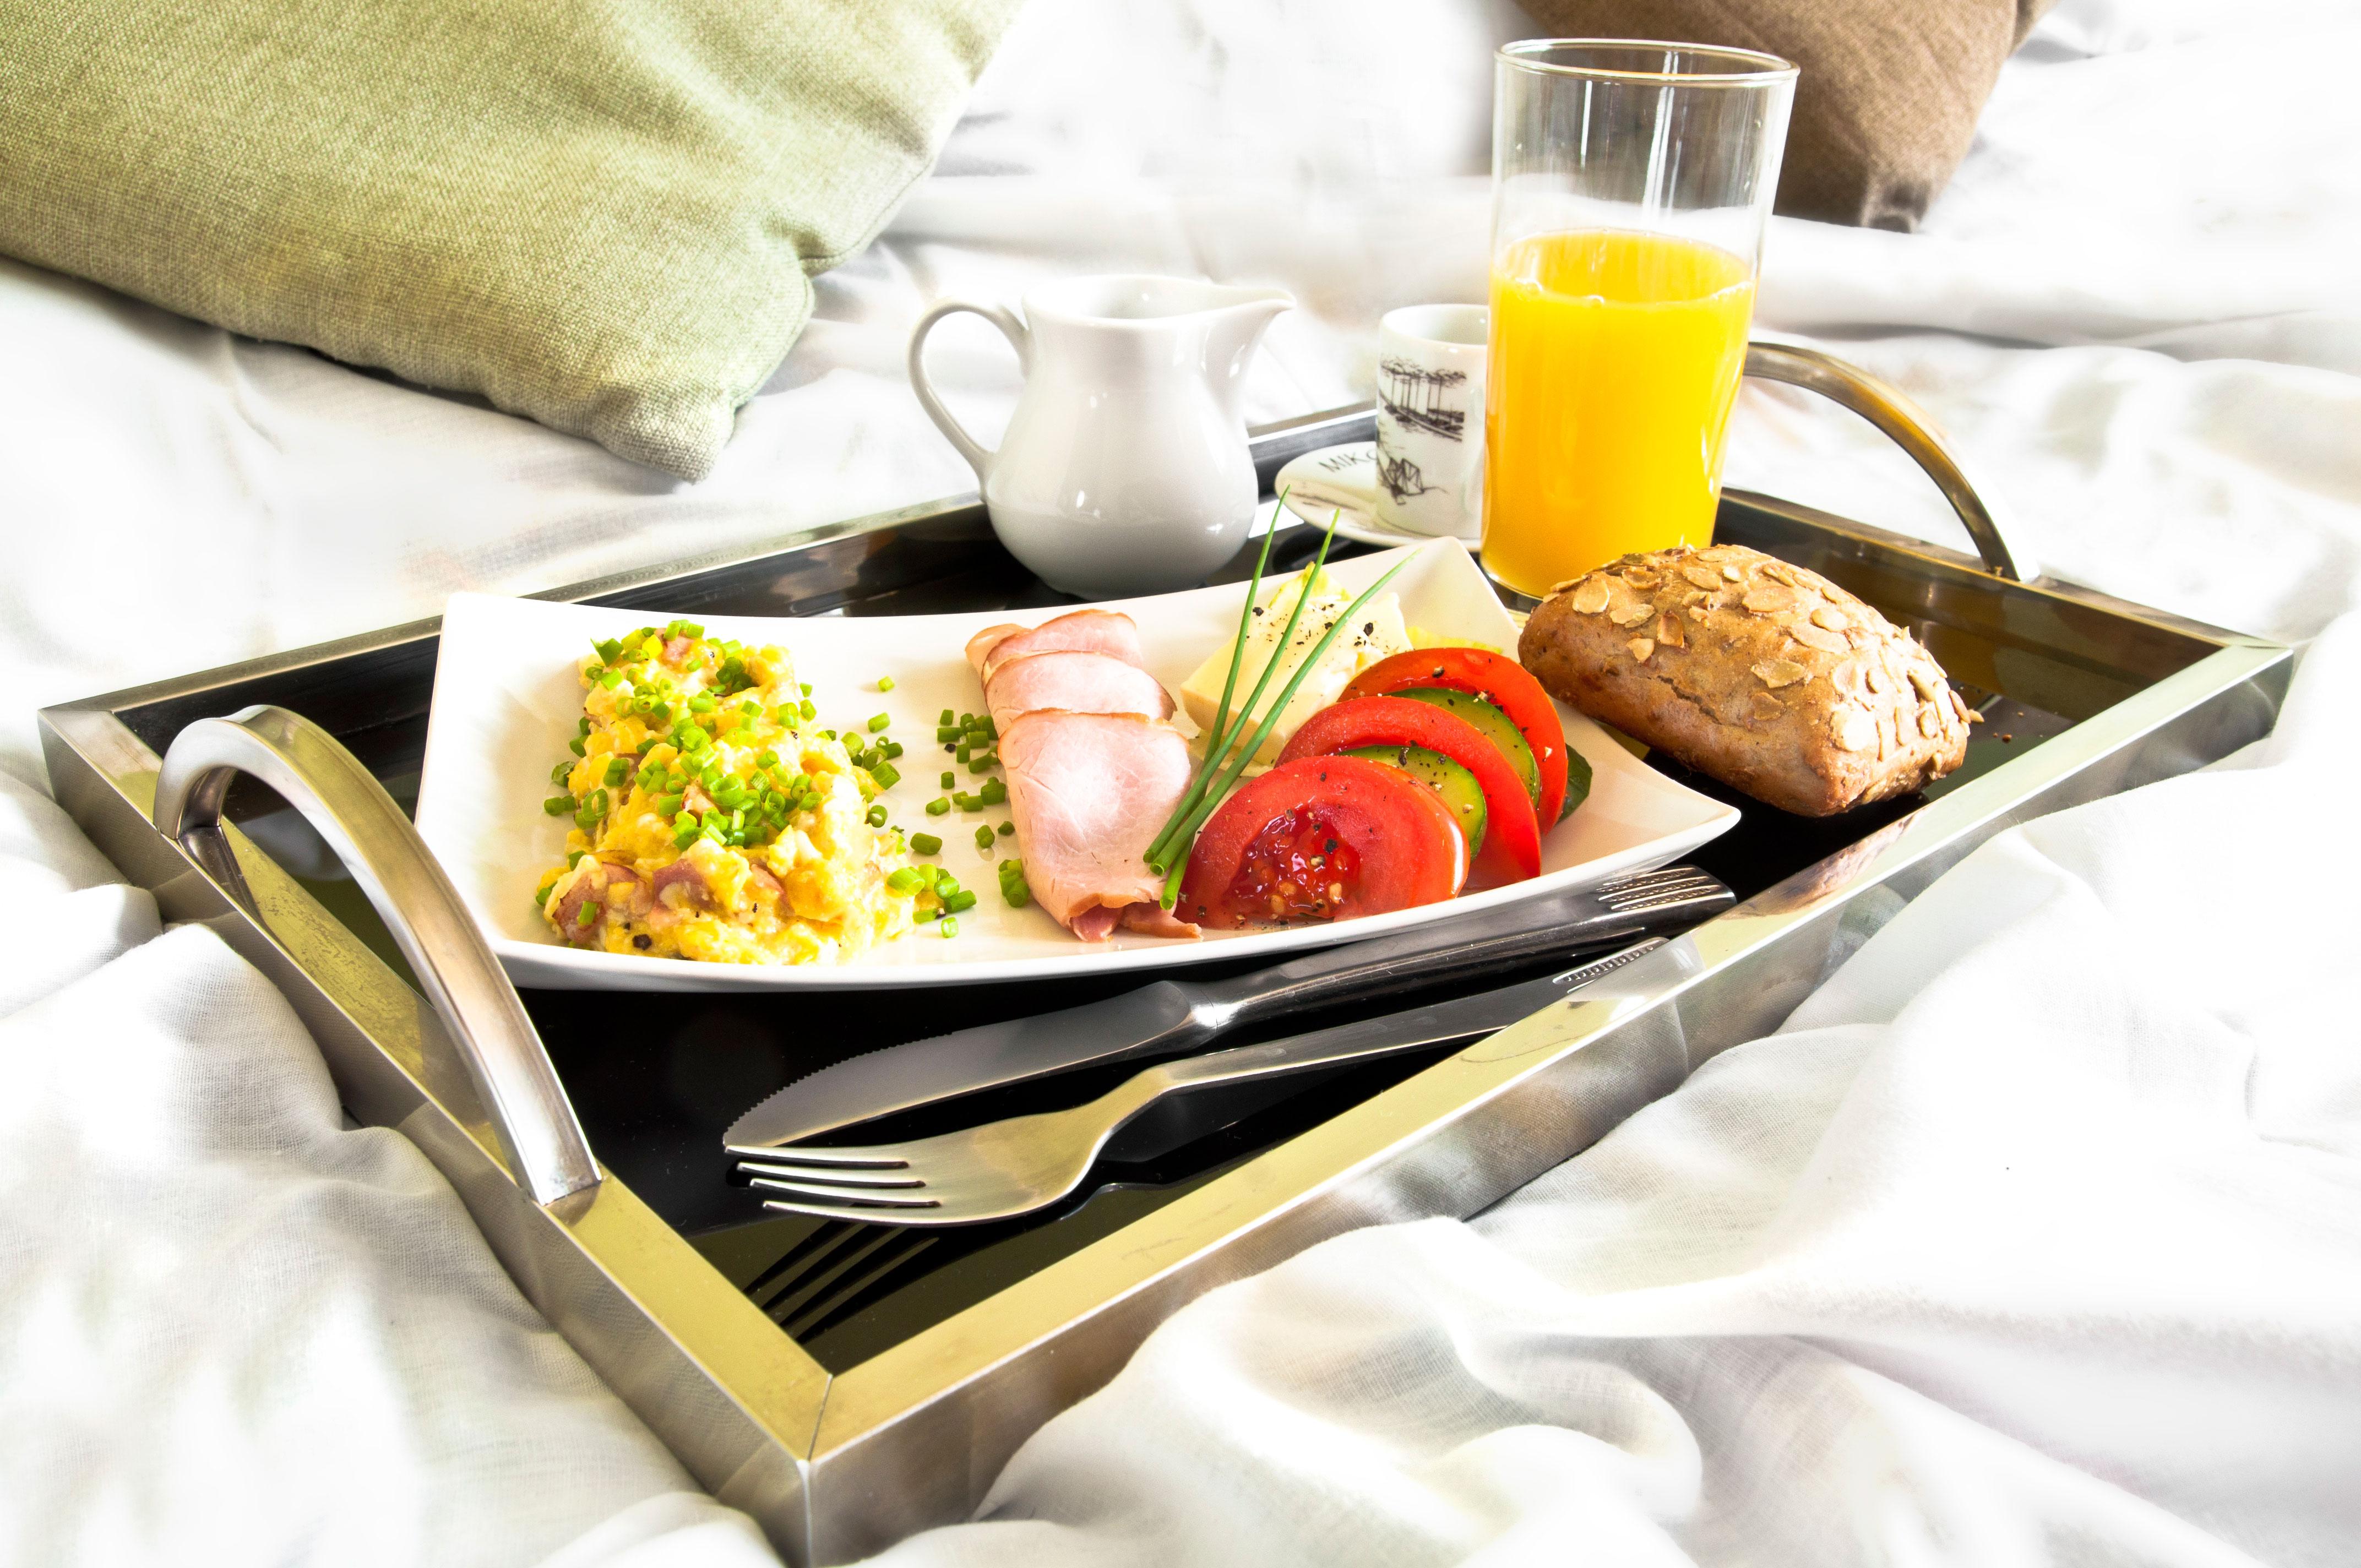 Hotel restaurant, breakfast in bed